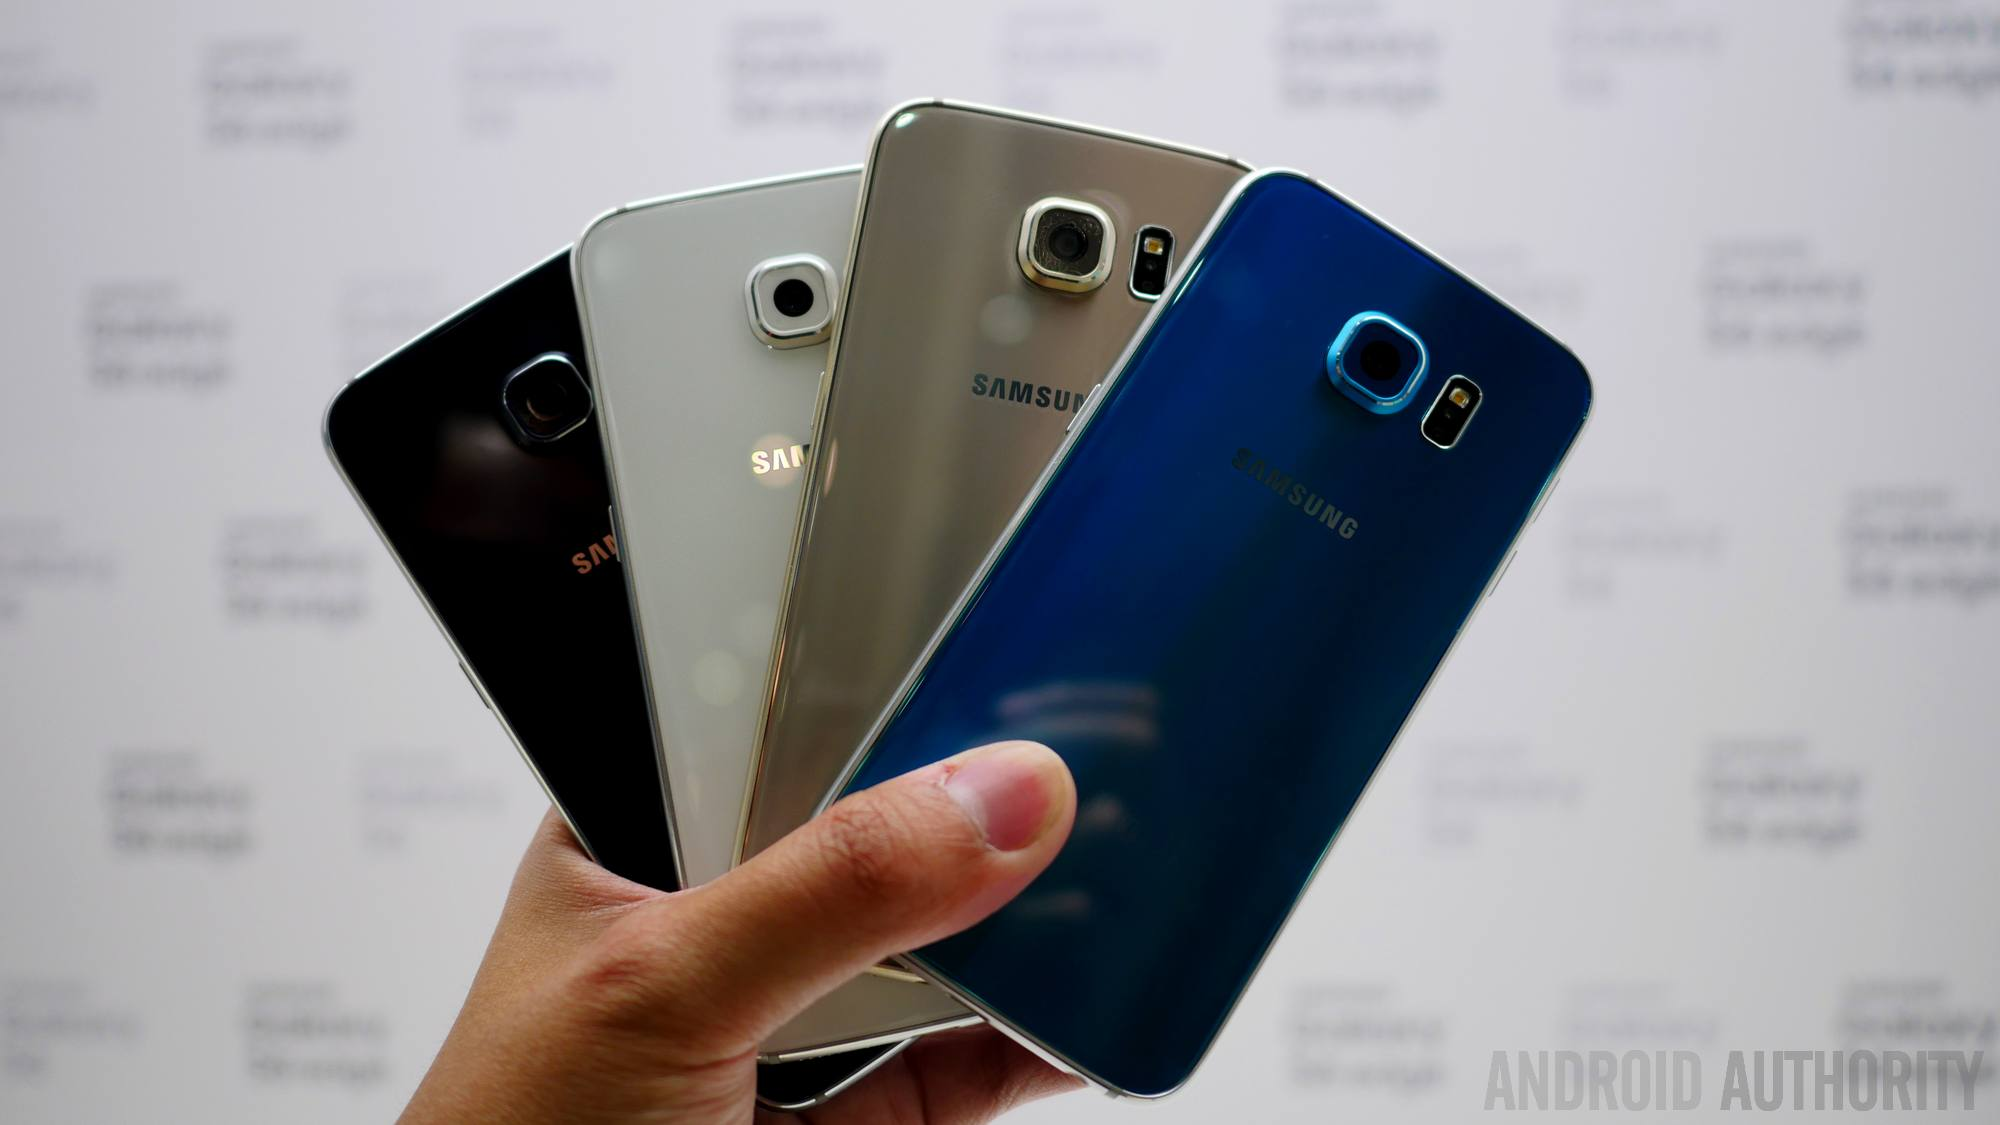 Samsung galaxy s6 color comparison